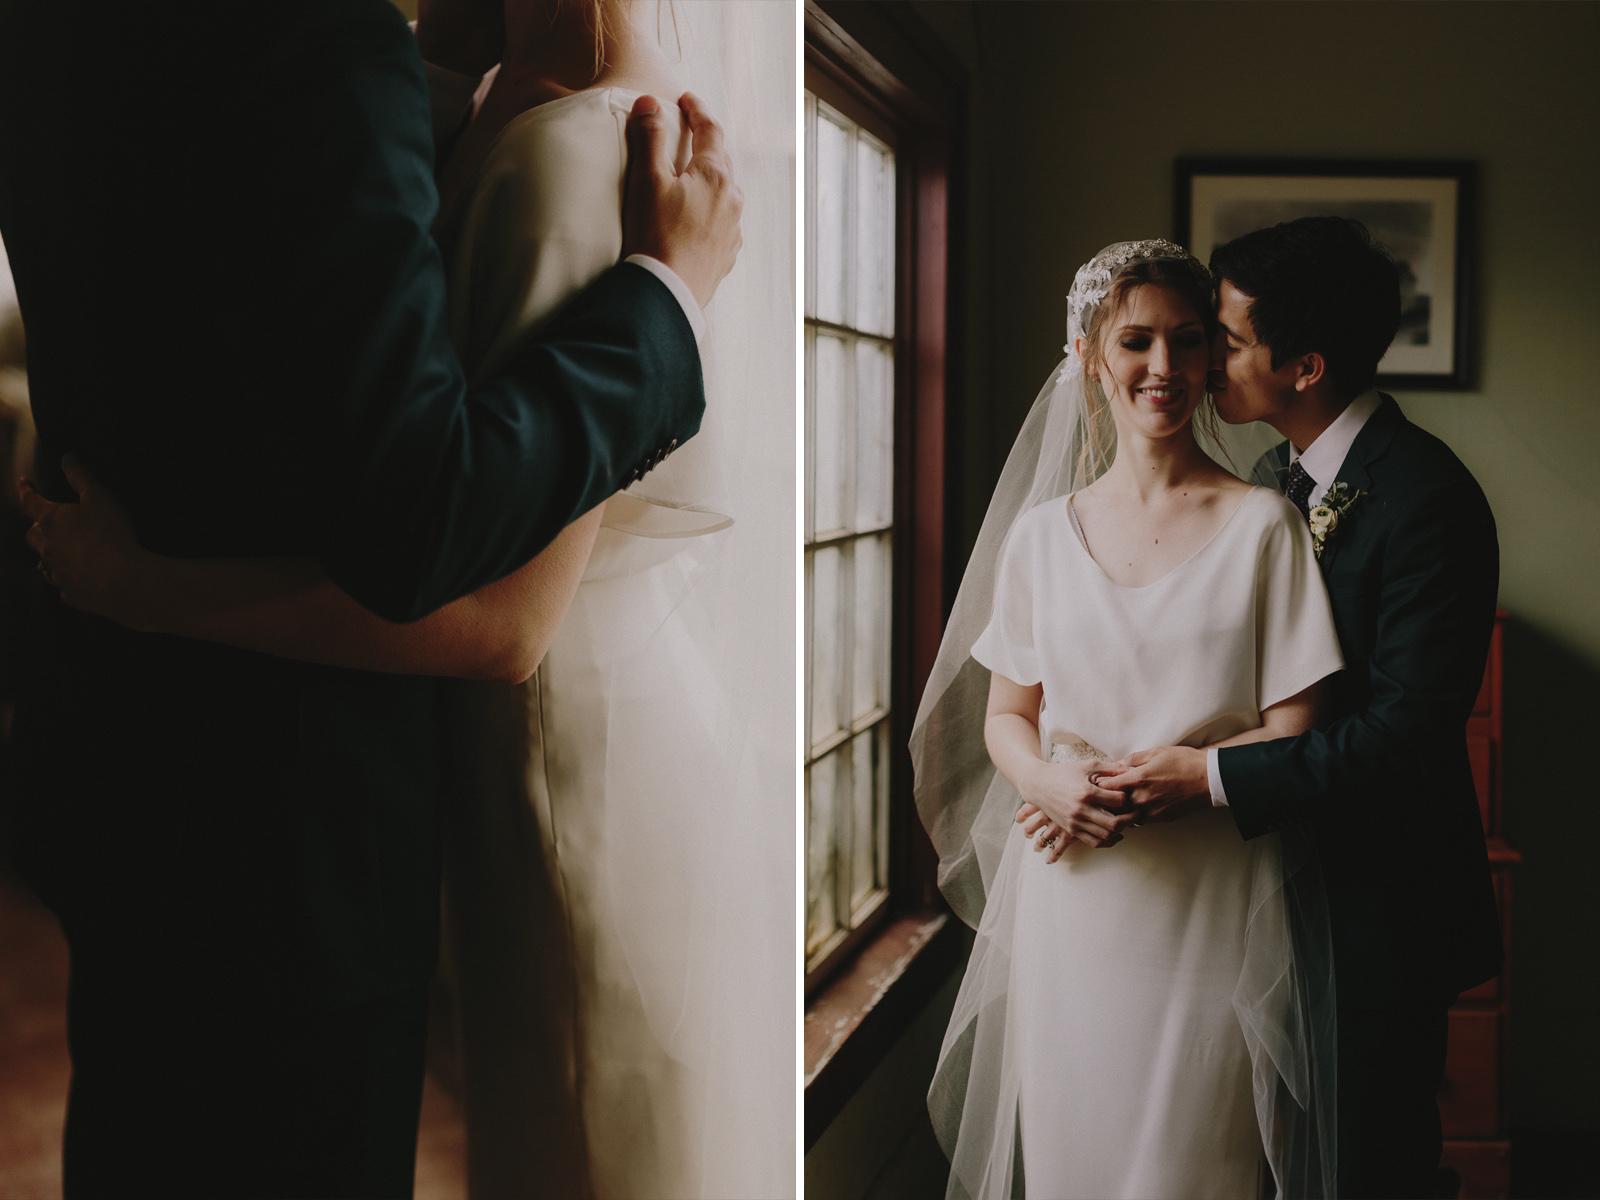 trish-lee-blouson-wedding-dress-4.jpg